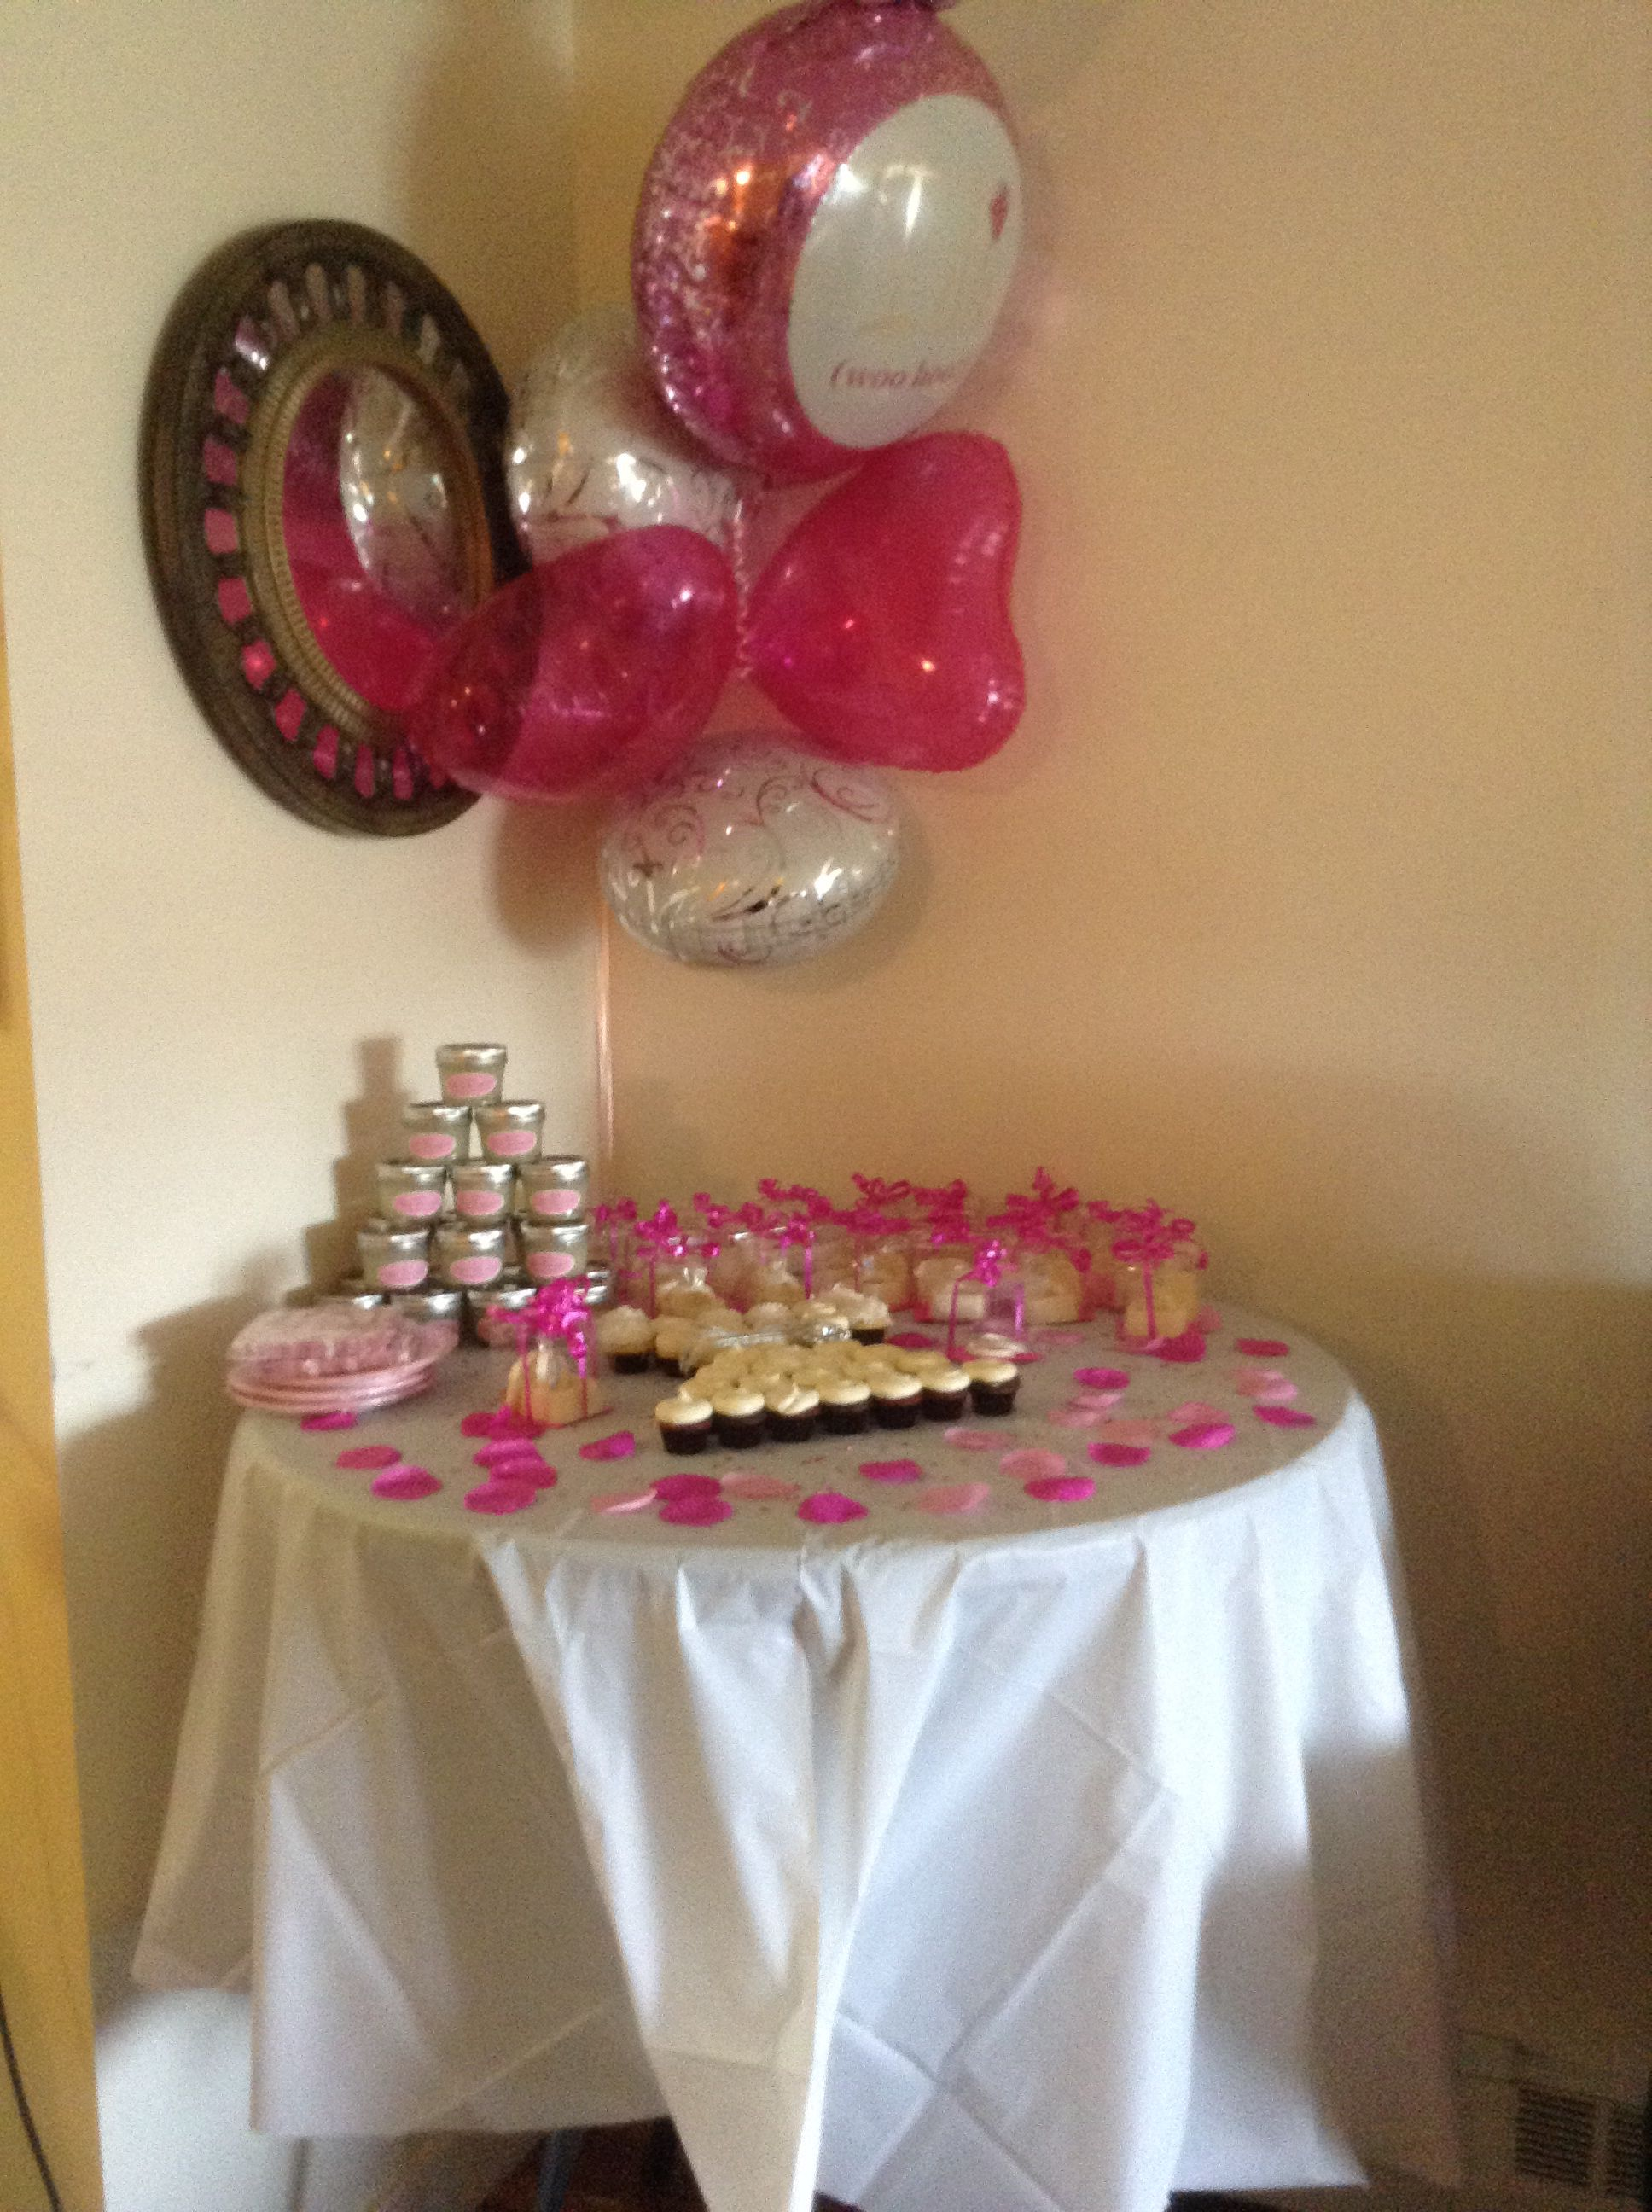 Cupcakes And Keepsakes Bridal Shower Birthday Candles Candles